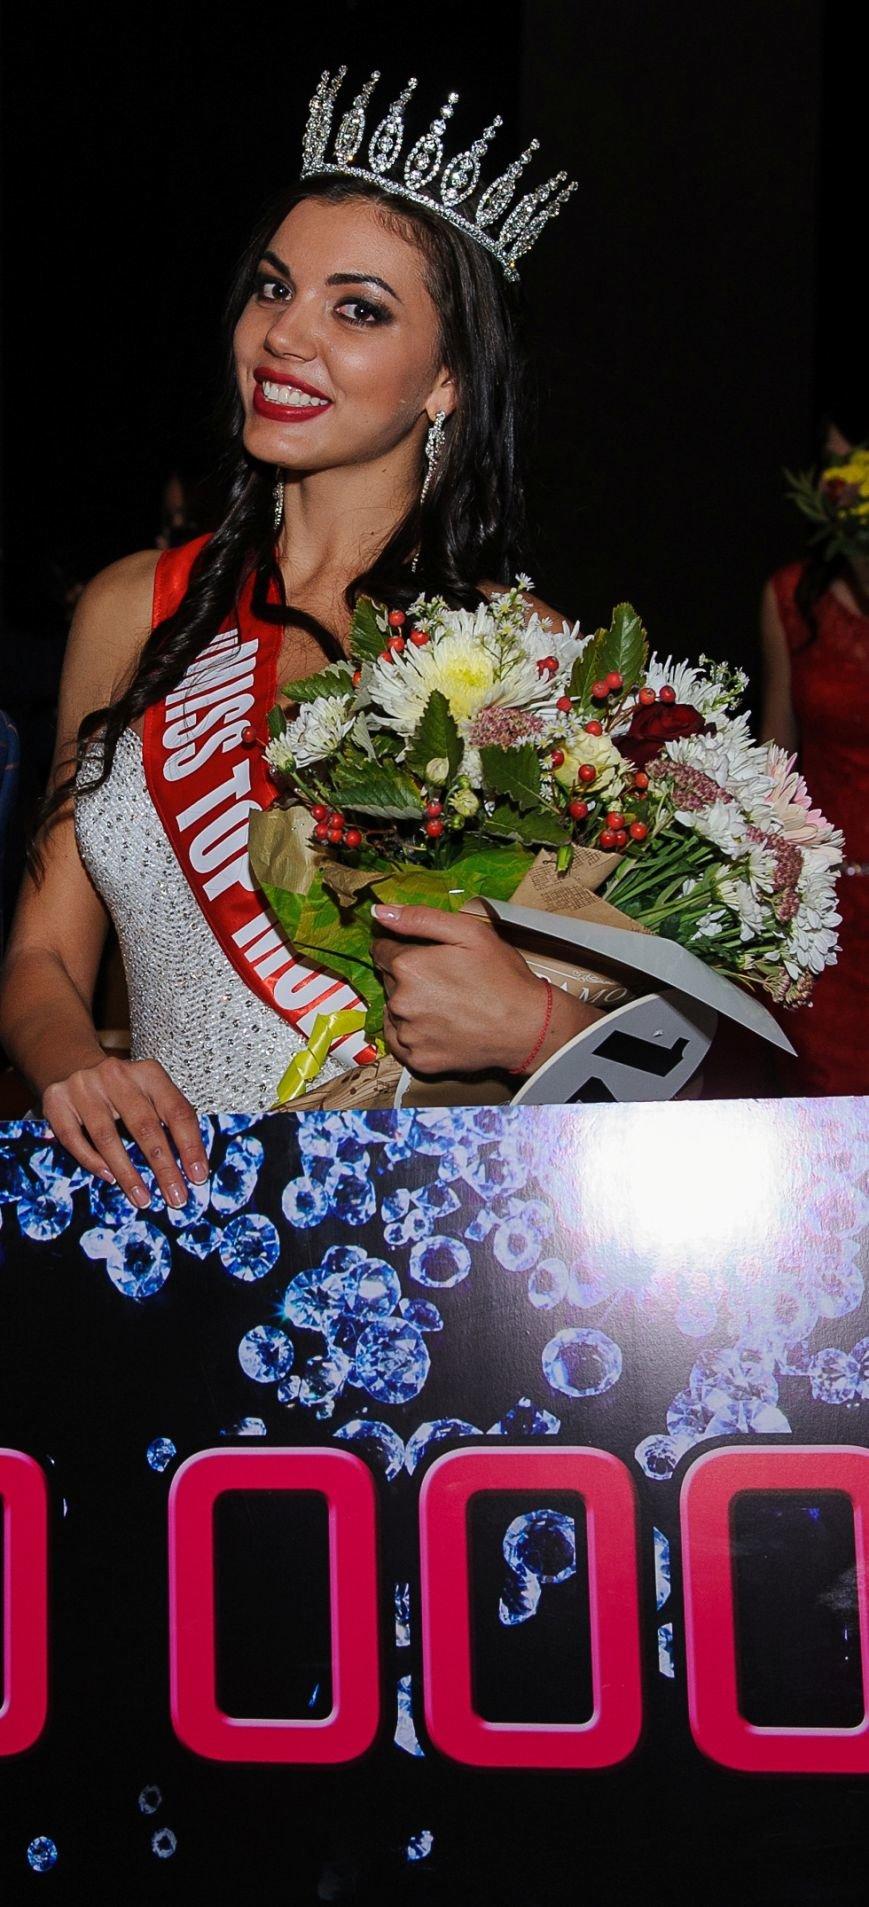 В Николаев на «MissTopModelUkraine» съехались красотки со всей Украины (ФОТО), фото-9